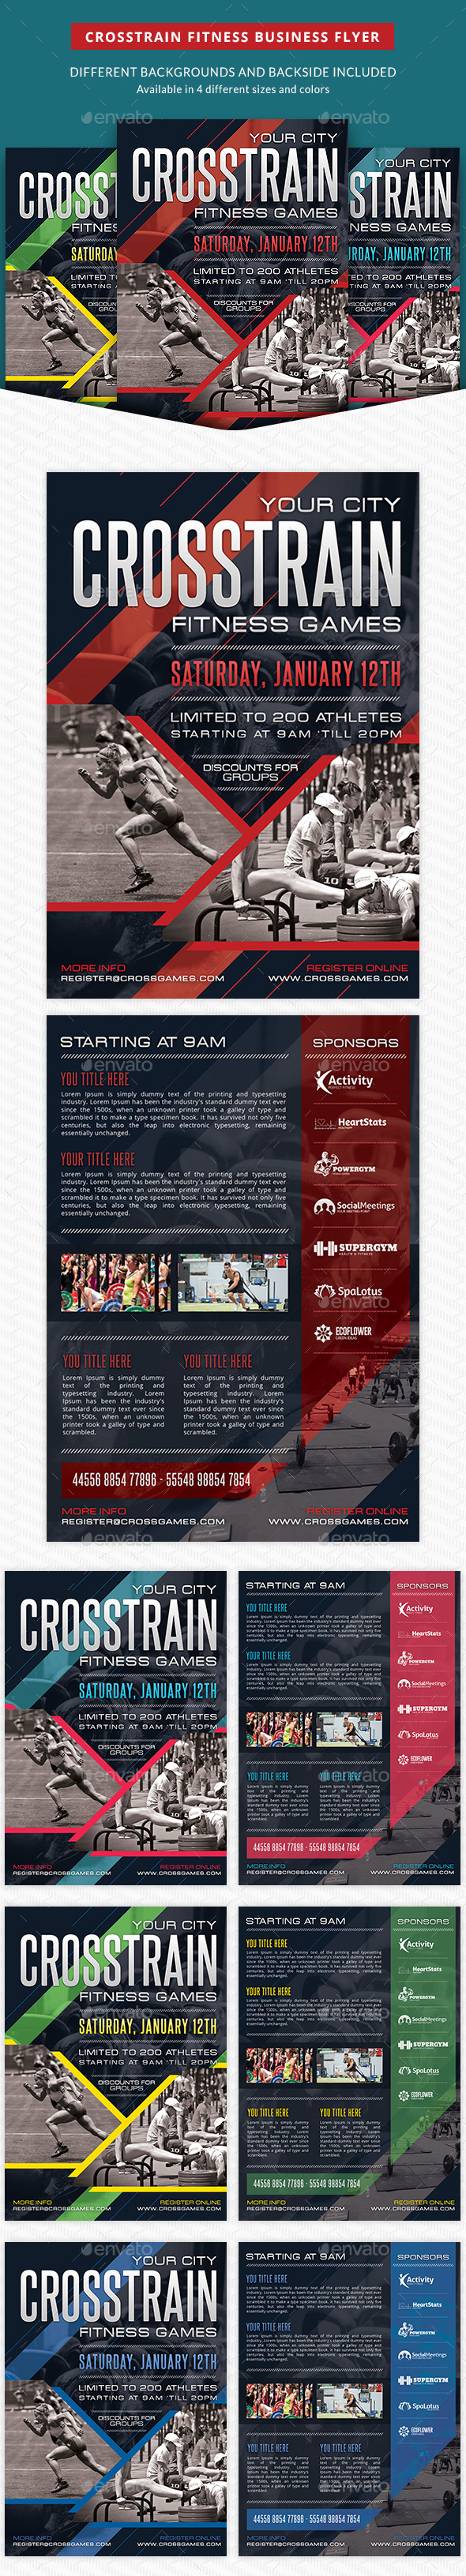 Crosstrain Fitness Gym Promotion Flyer - Sports Events